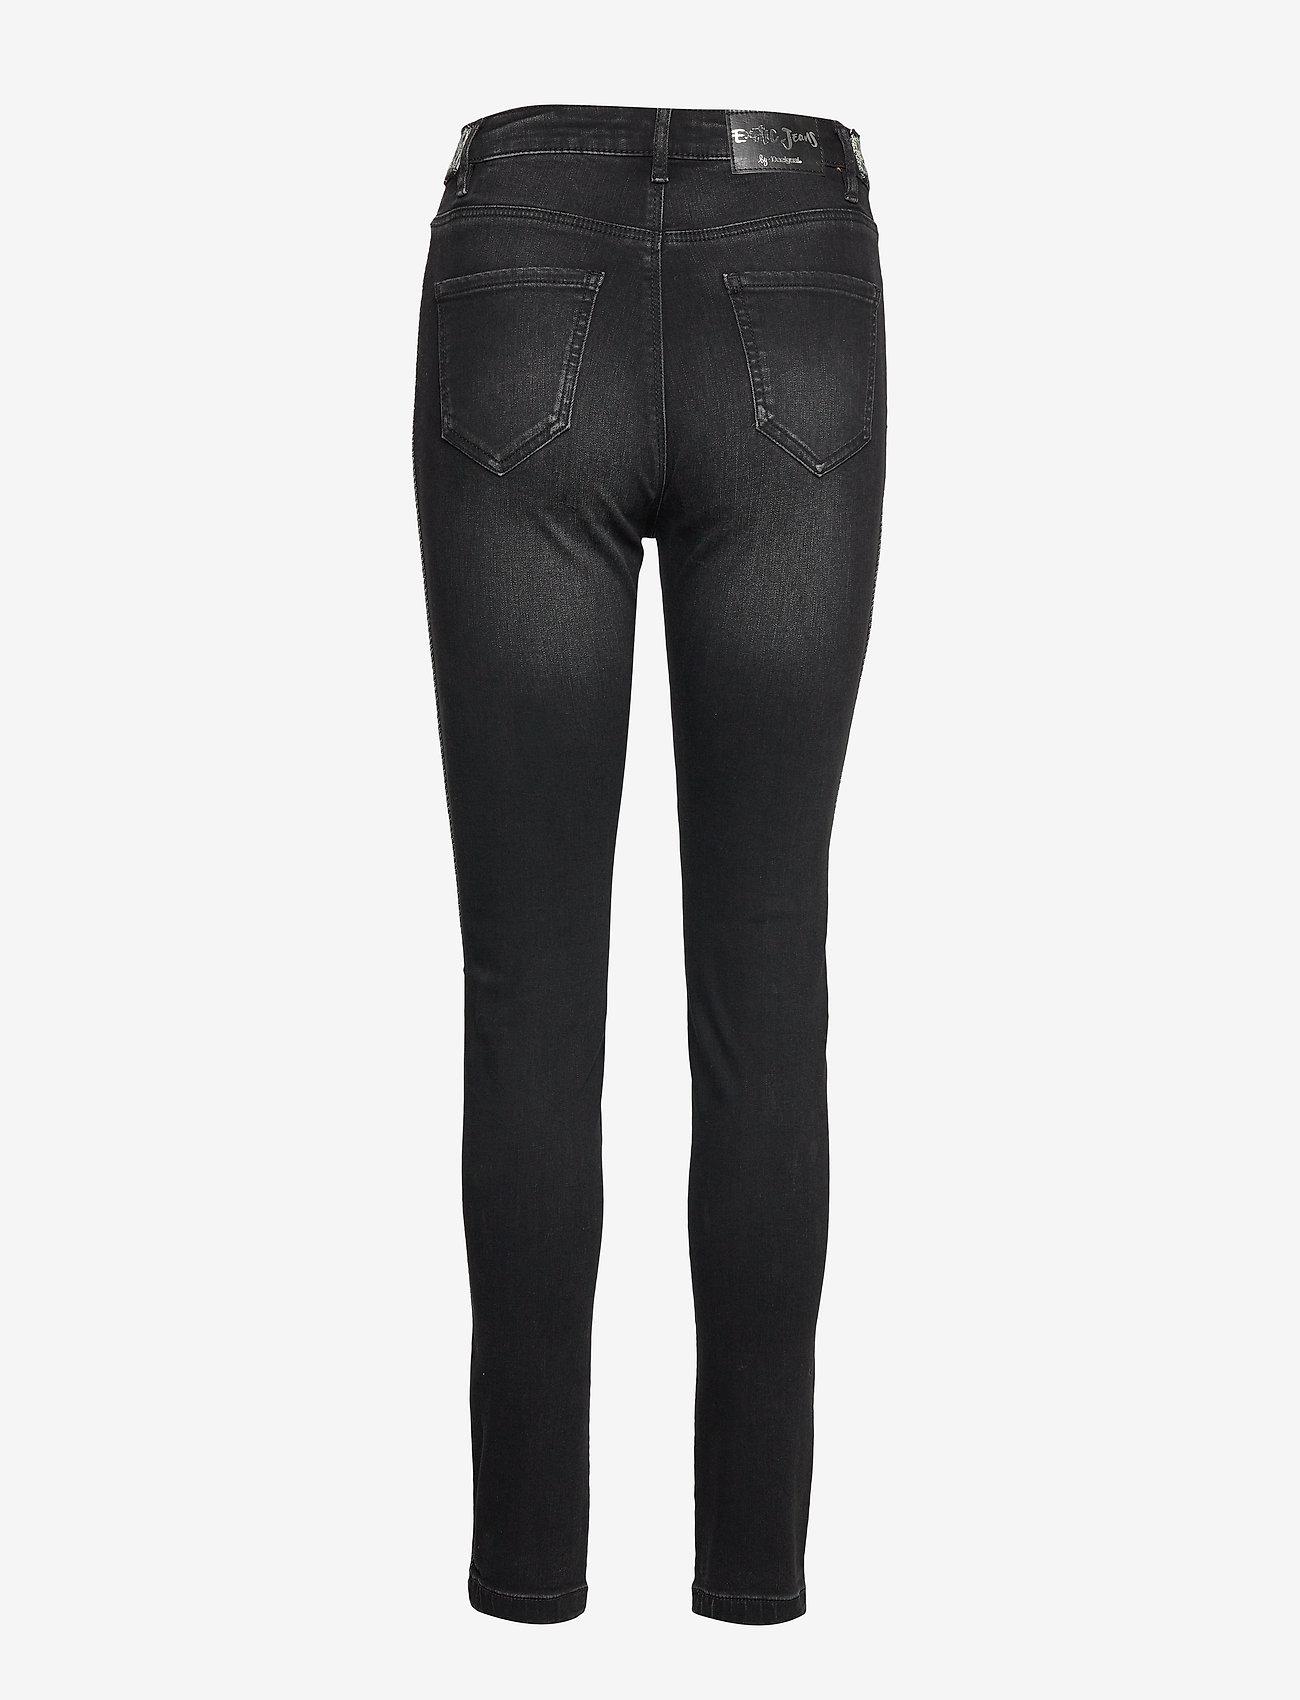 Desigual - DENIM NEW YOR - skinny jeans - denim black wash - 1